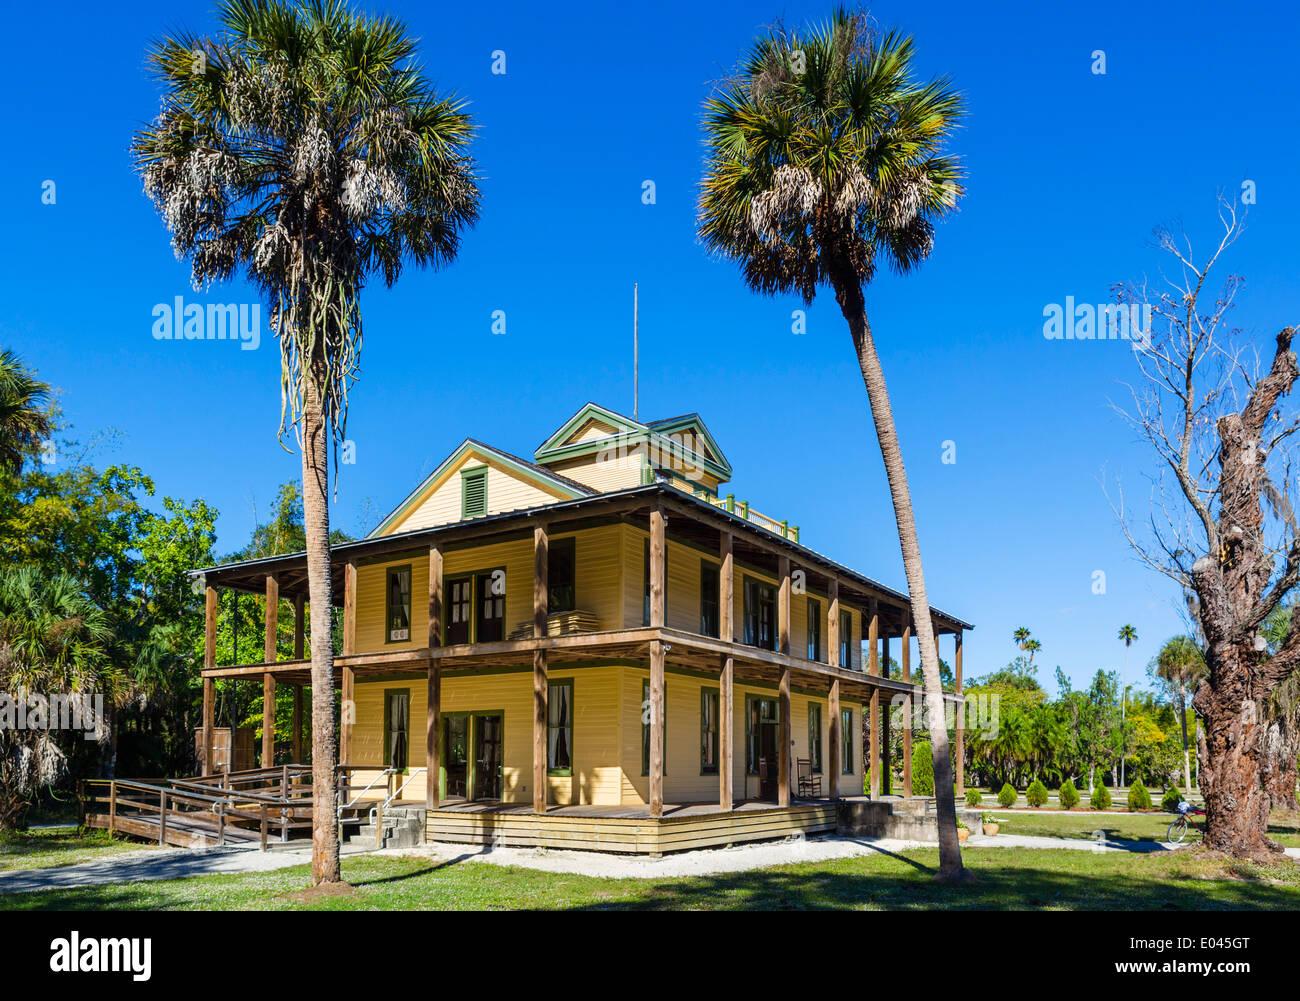 The Planetary Court Building of the Koreshan Unity Settlement, Koreshan State Historic Park, Estero, nr Fort Myers, - Stock Image